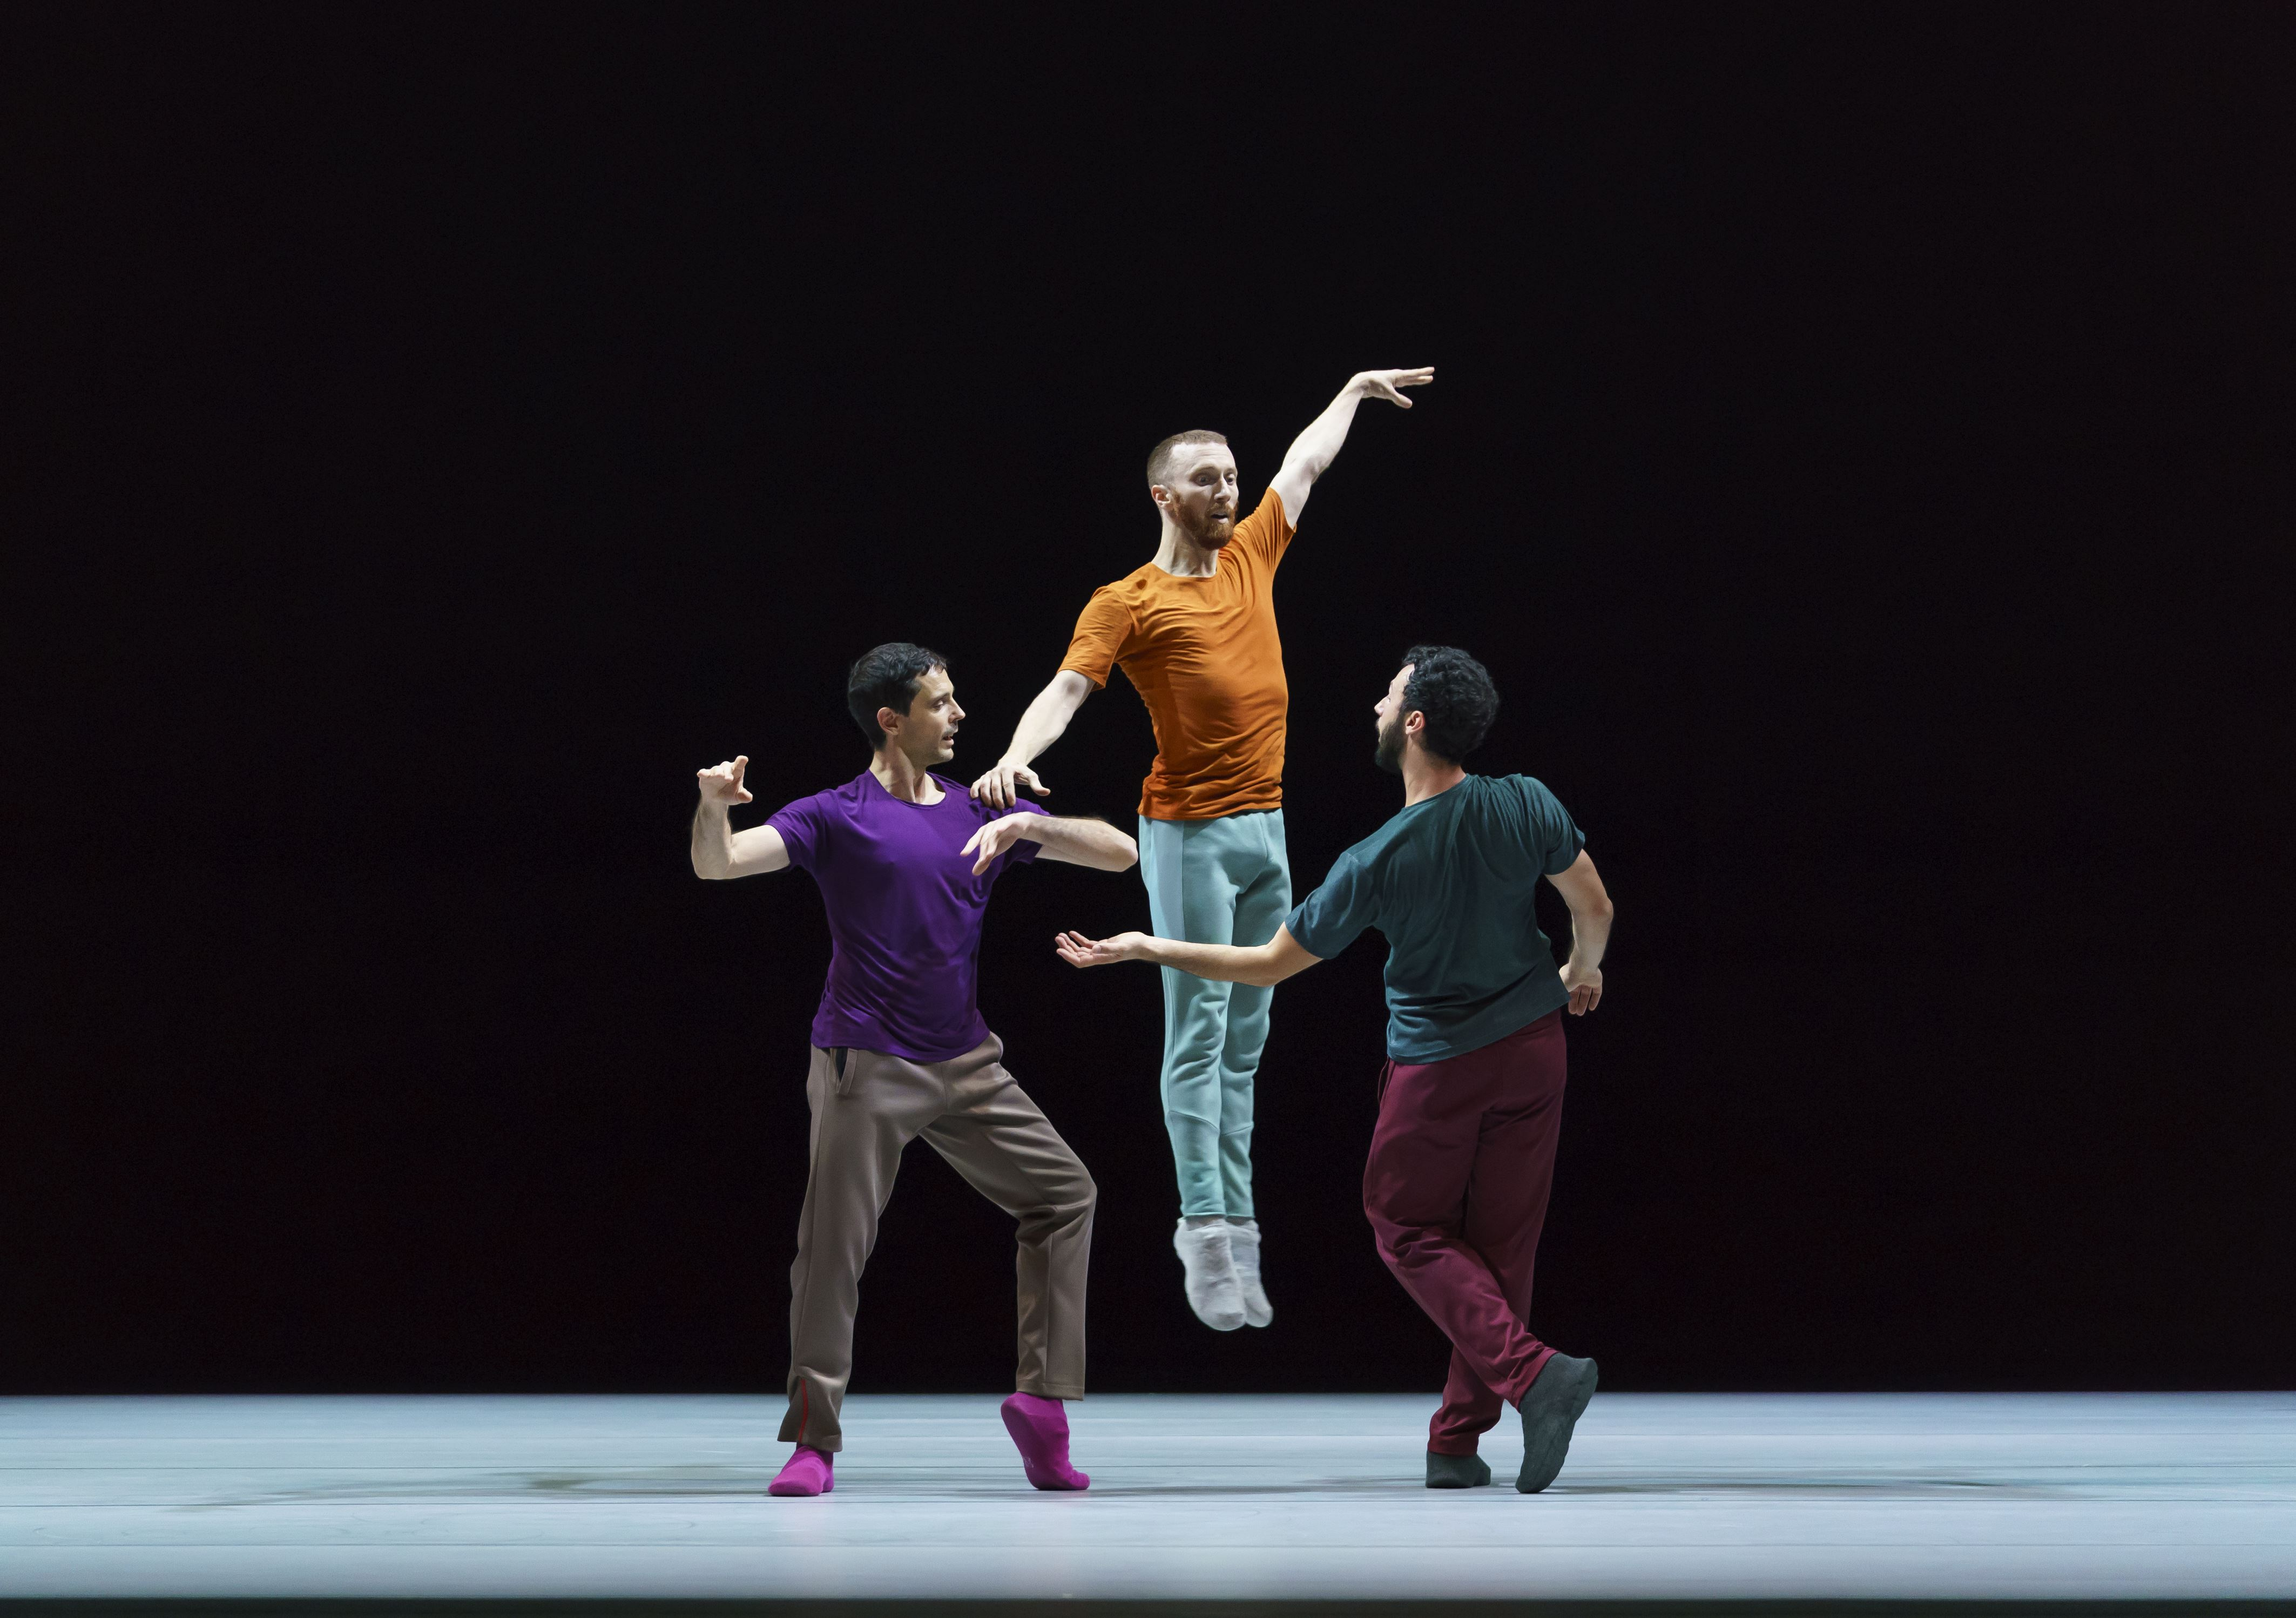 Festival Montpellier Danse - William Forsythe - A quiet evening of dance